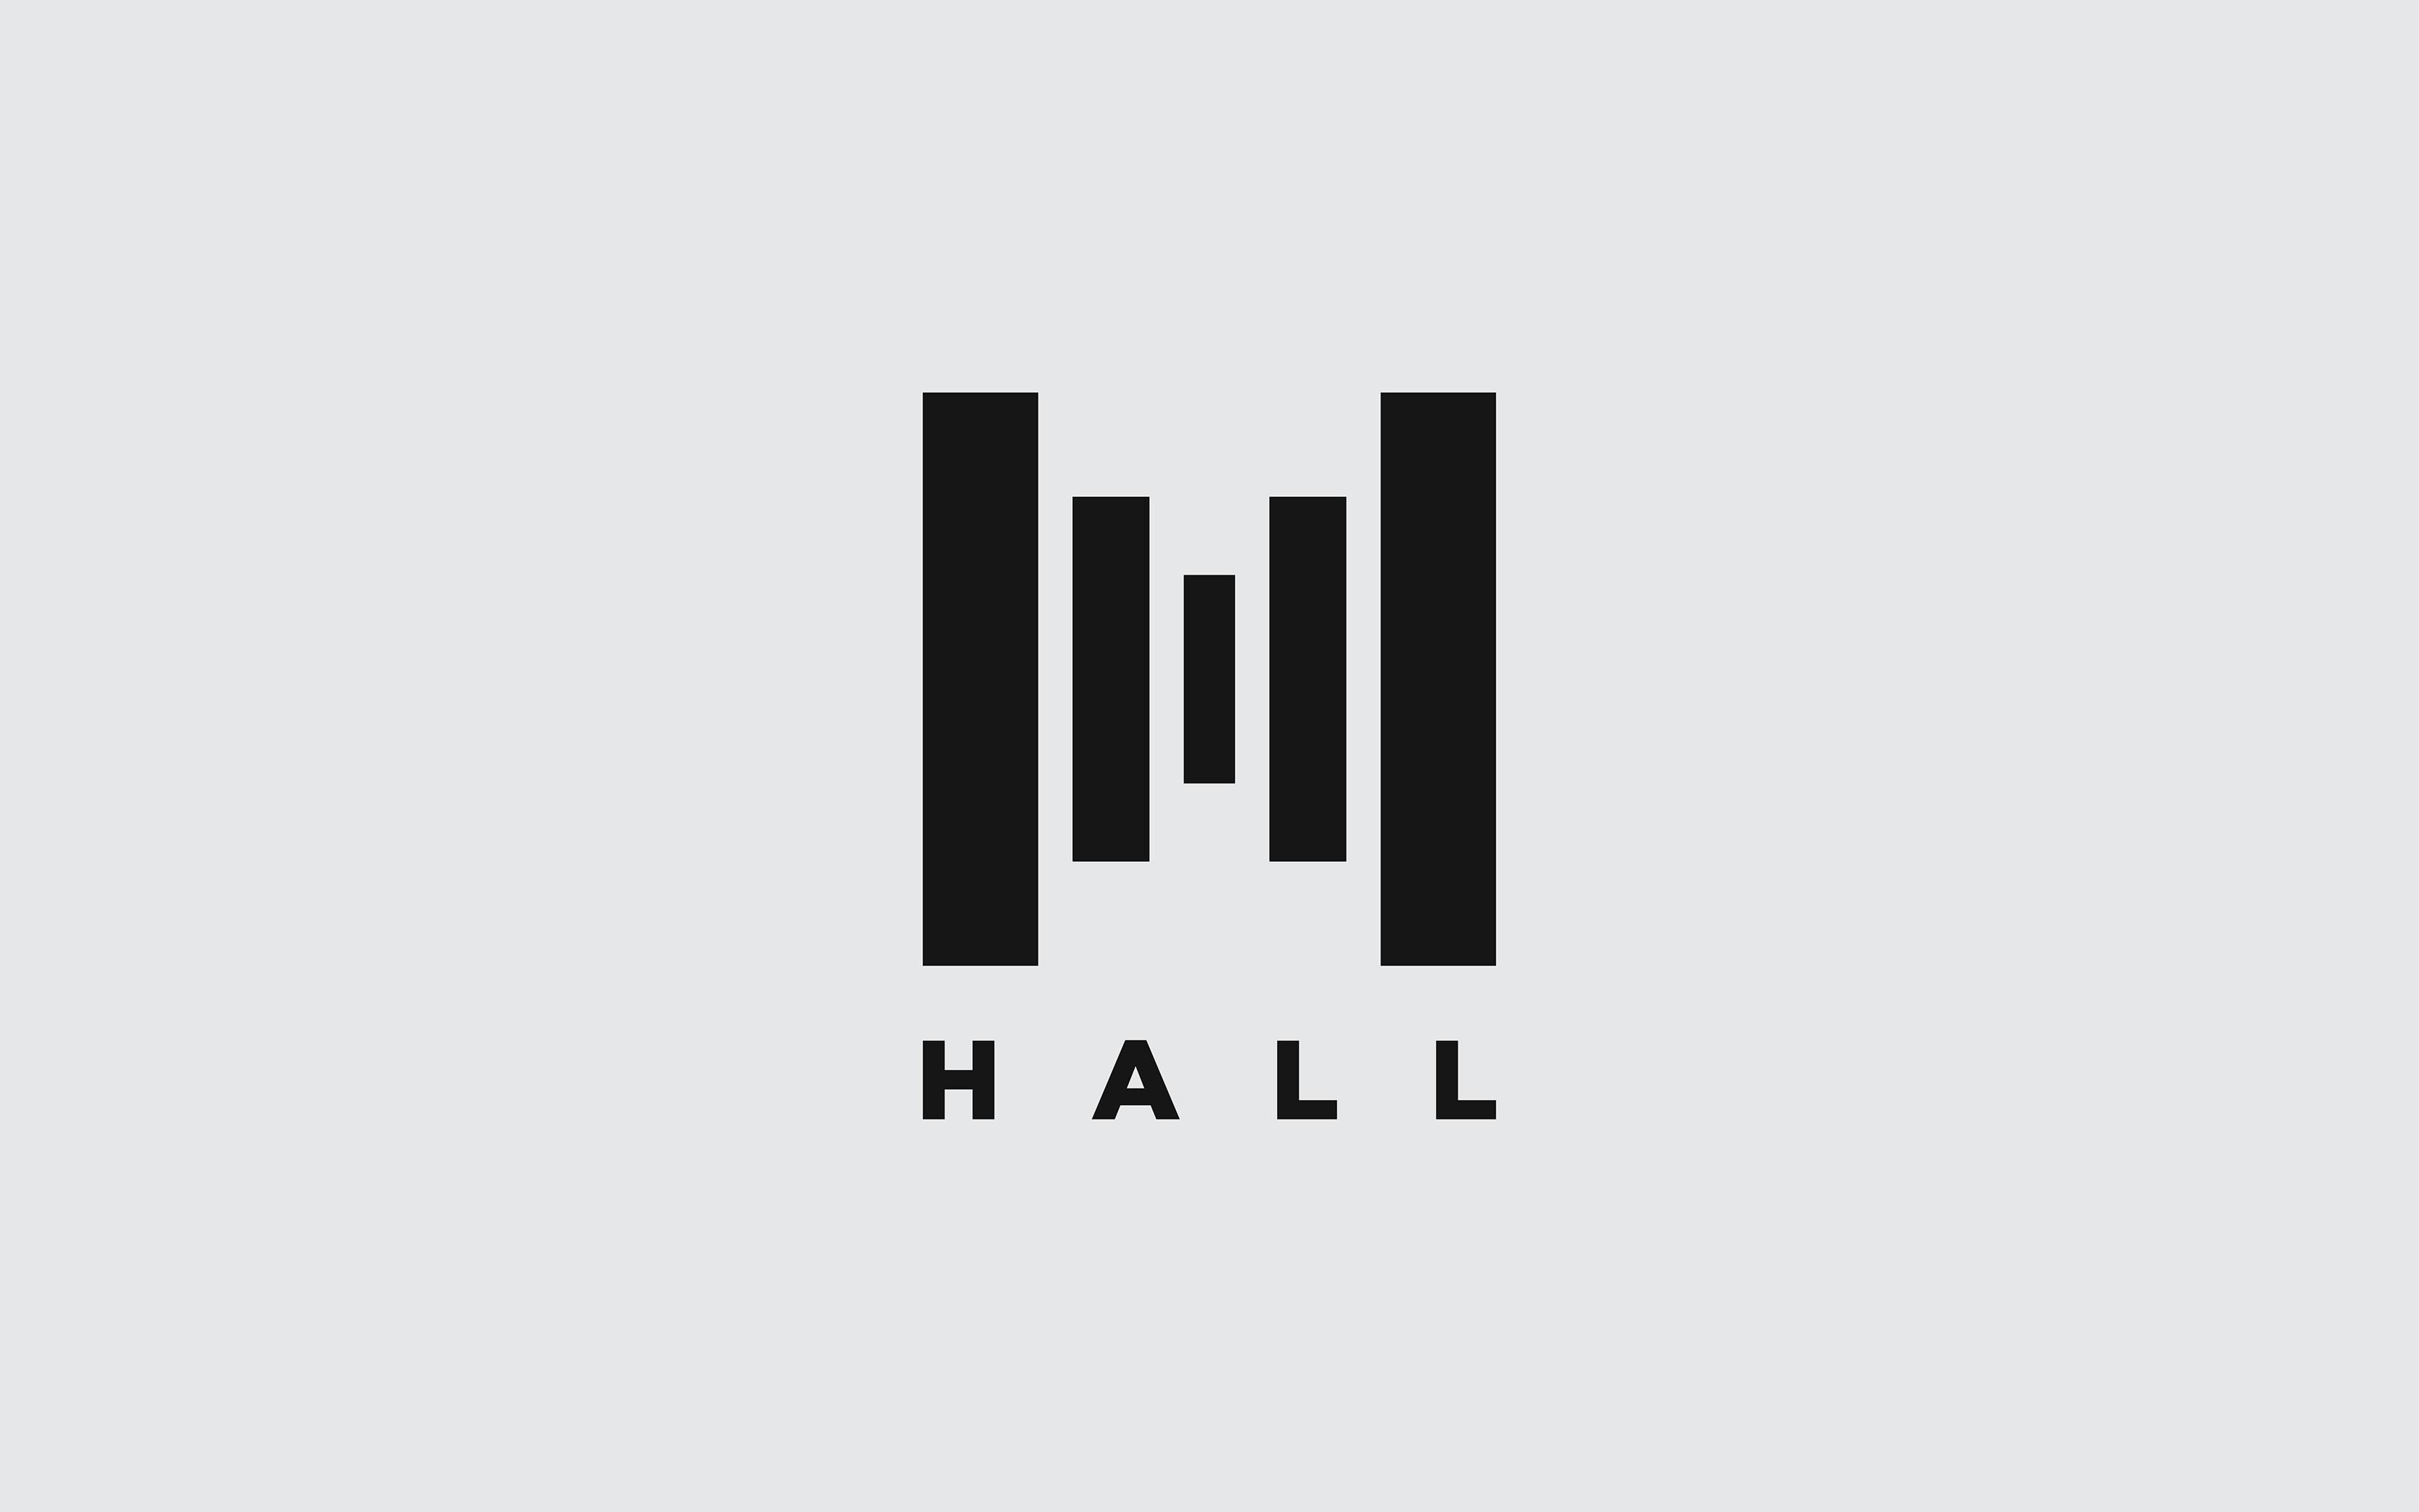 hall 演唱会品牌形象设计欣赏,所属类别:VIS设计、展览、活动、体育